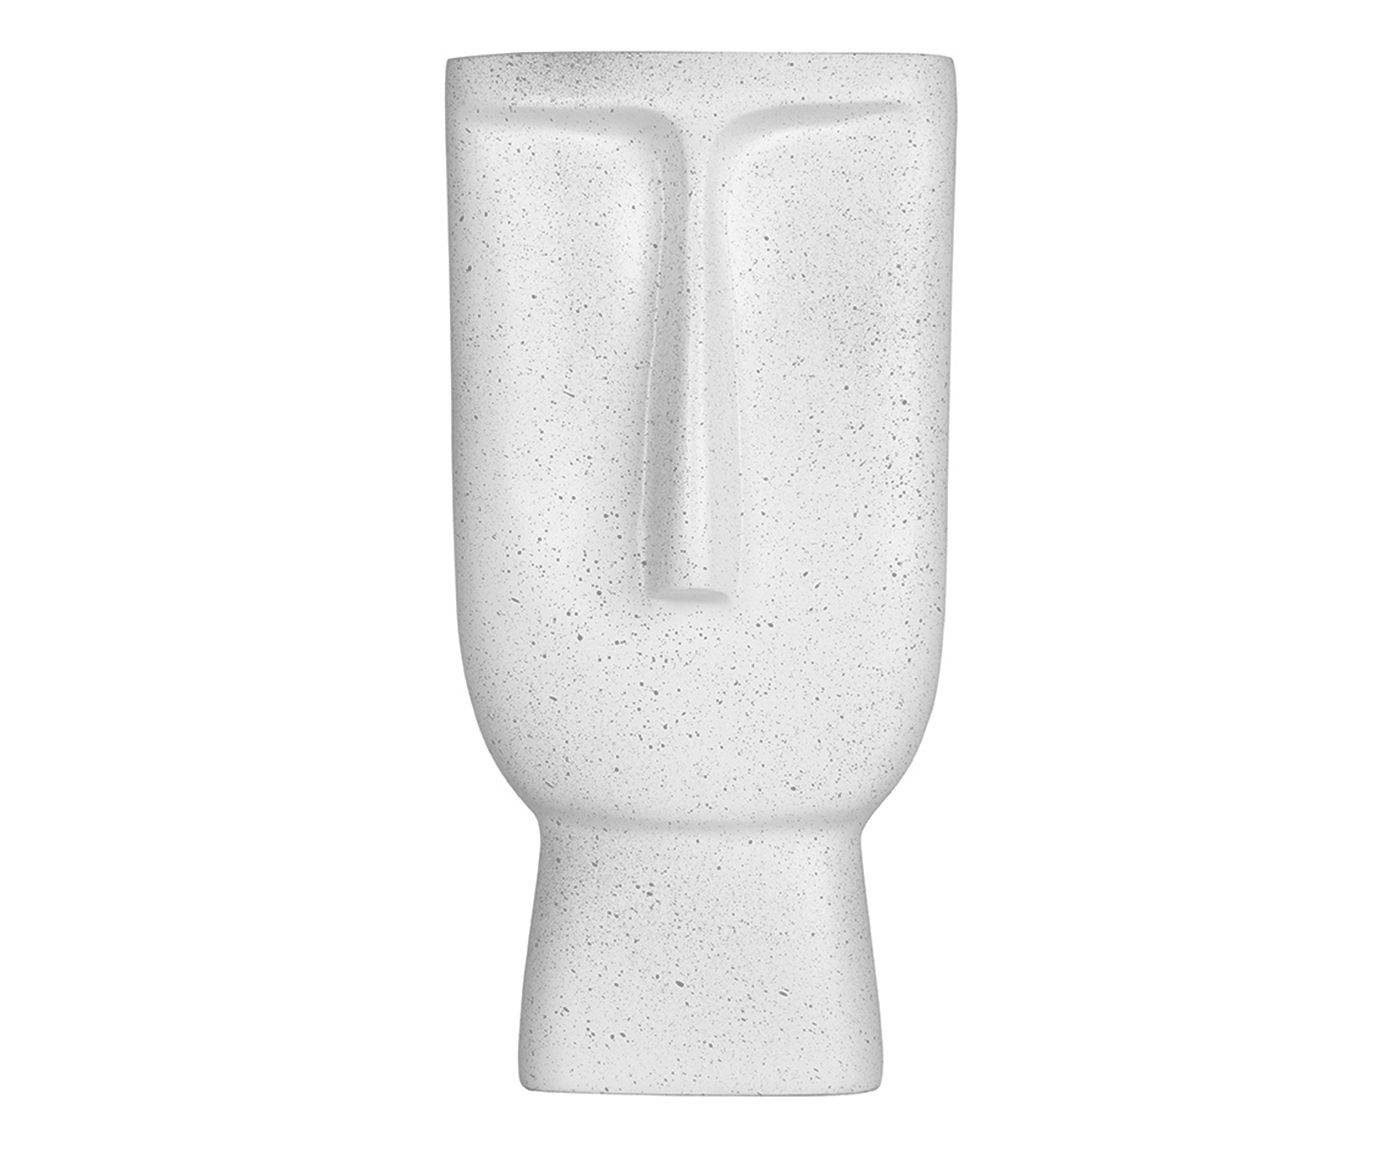 Vaso Face Branco - 38X19X11cm   Westwing.com.br